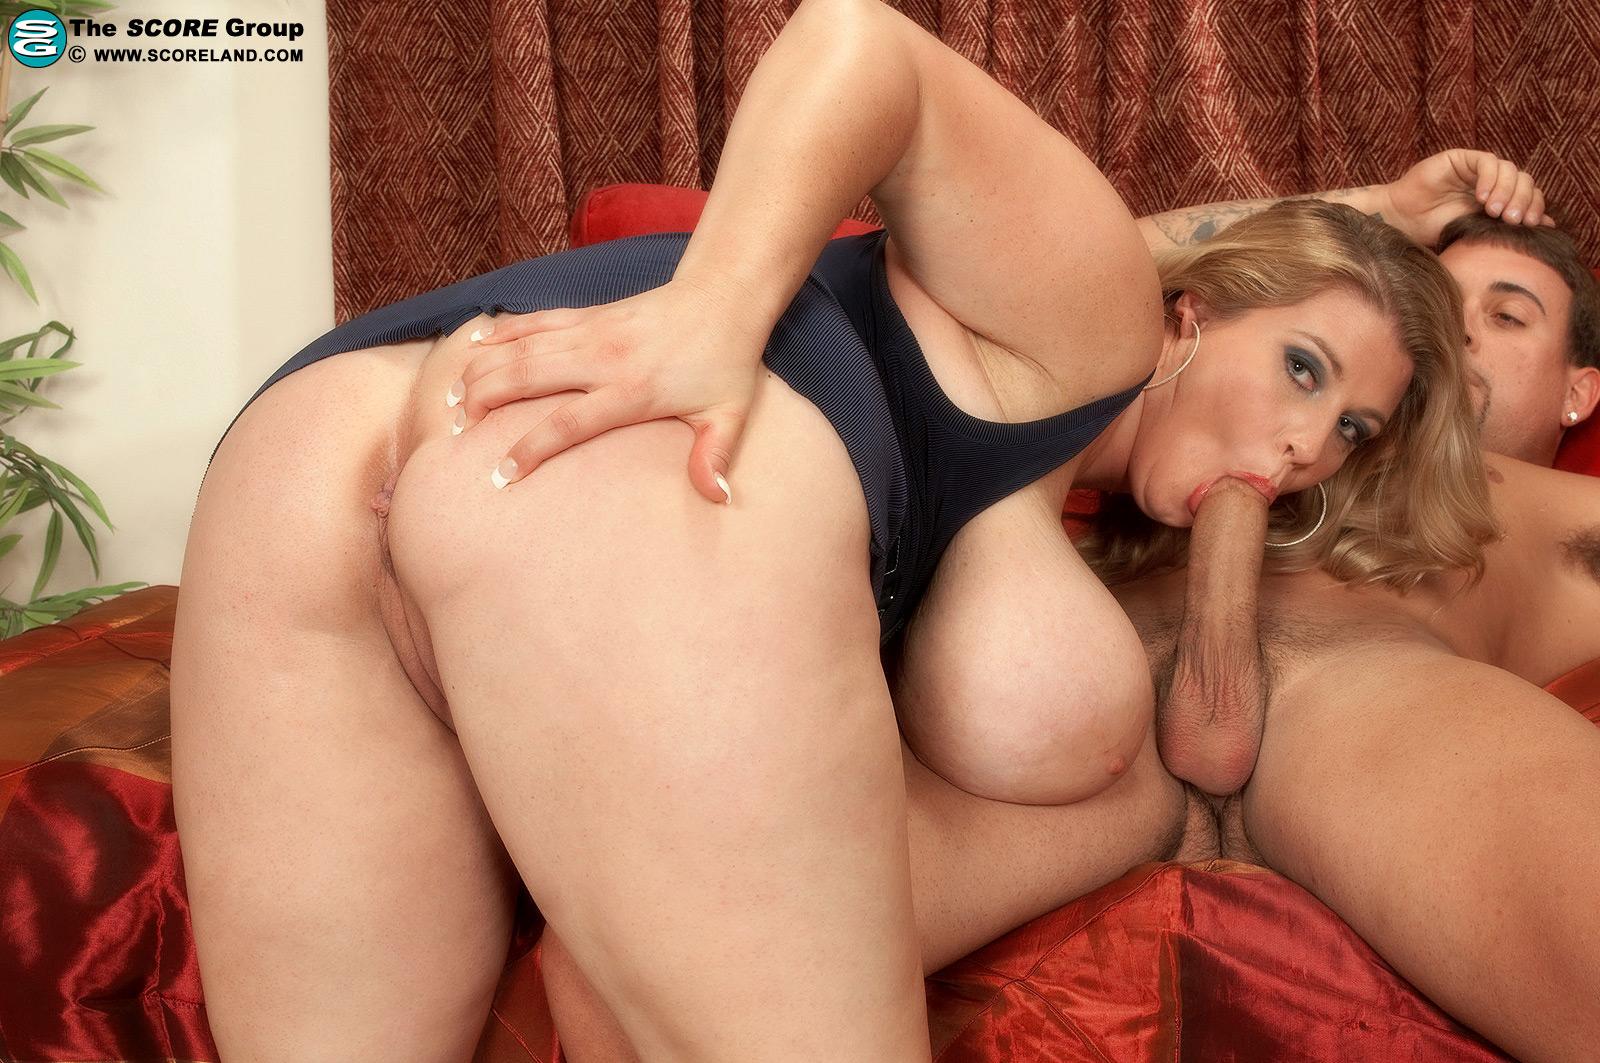 big butts boobs amp bellies renee ross